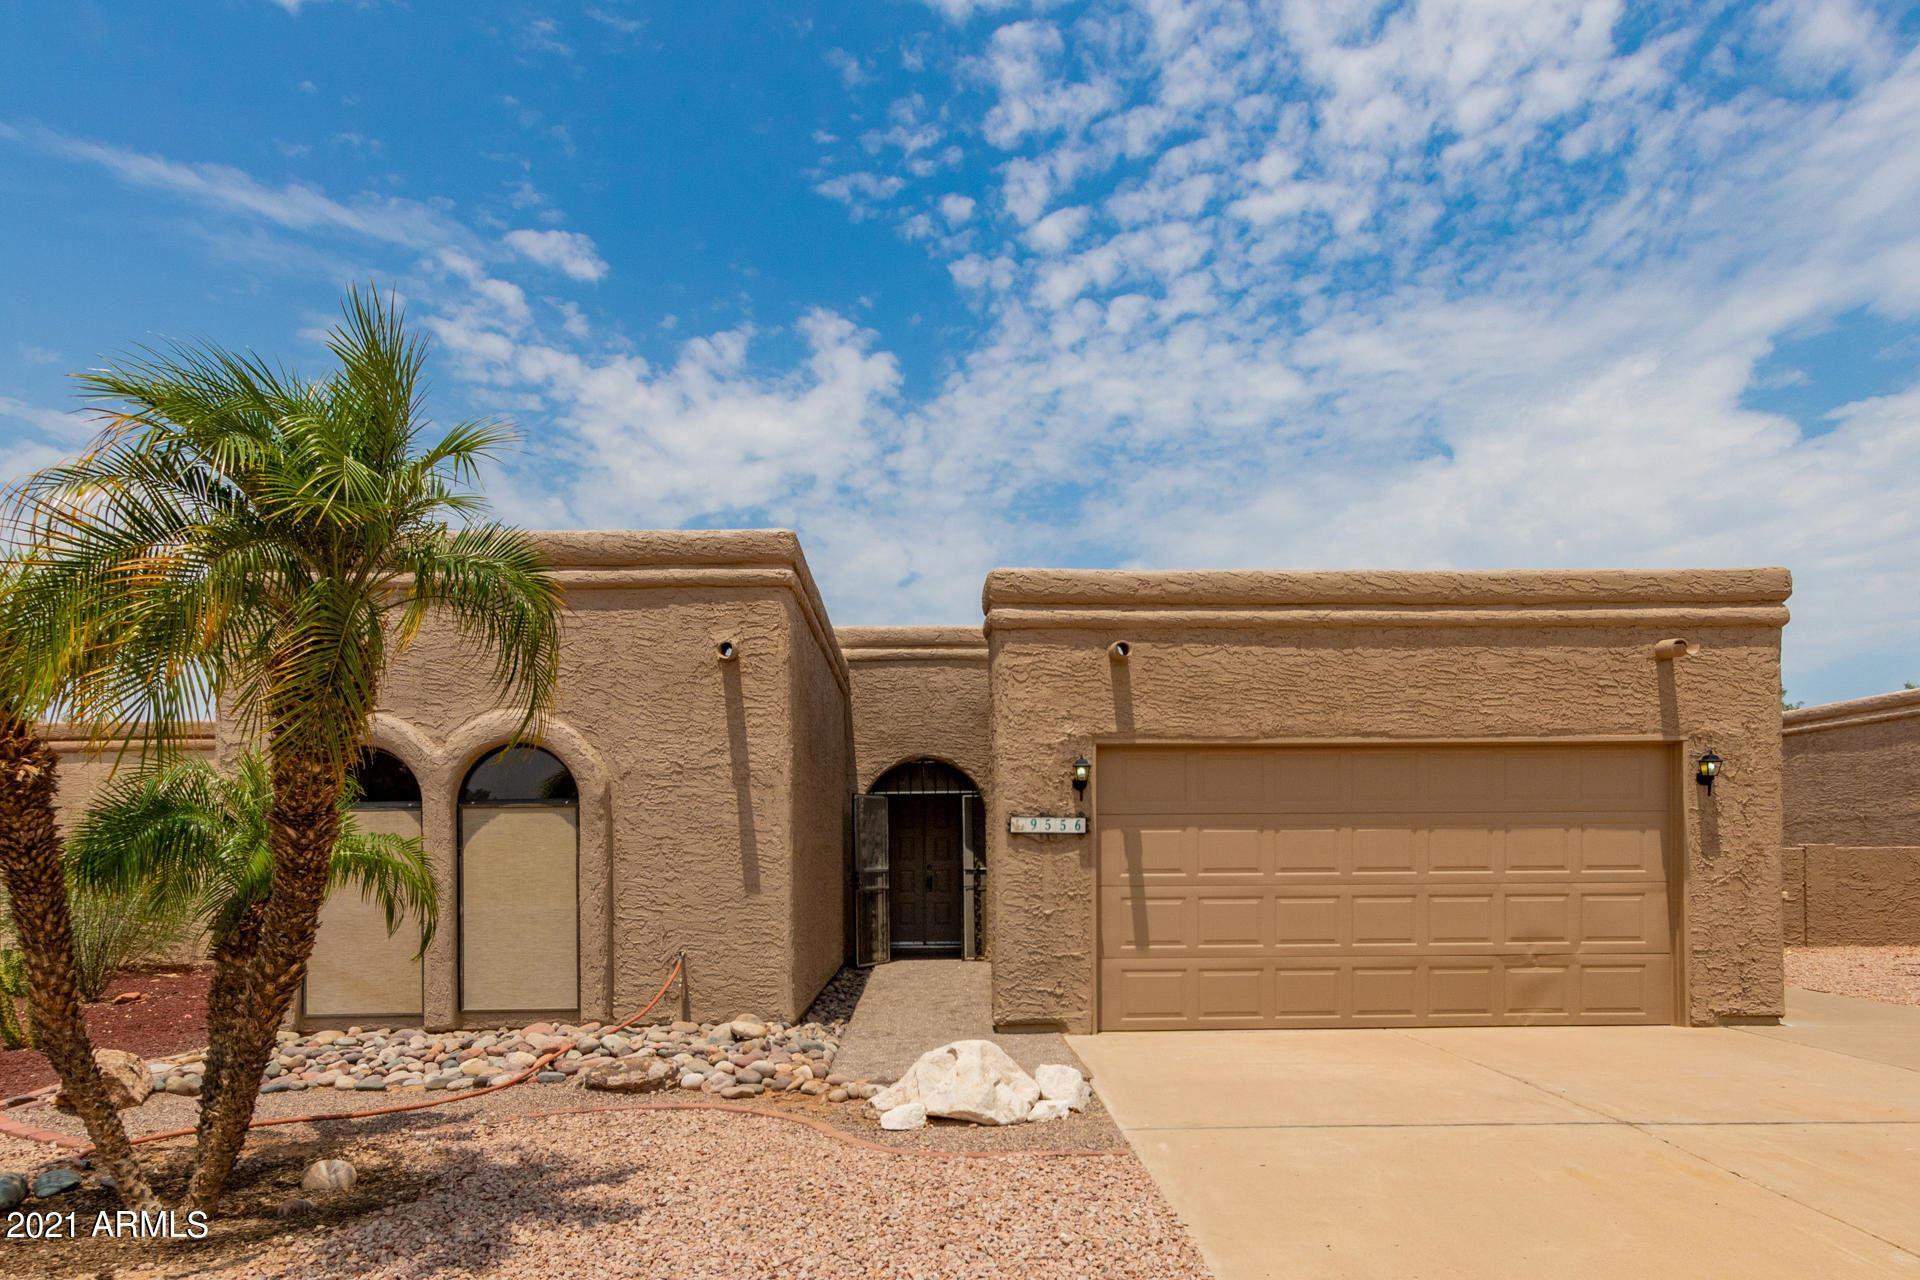 Photo of 9556 E PALOMINO Place, Sun Lakes, AZ 85248 (MLS # 6268224)